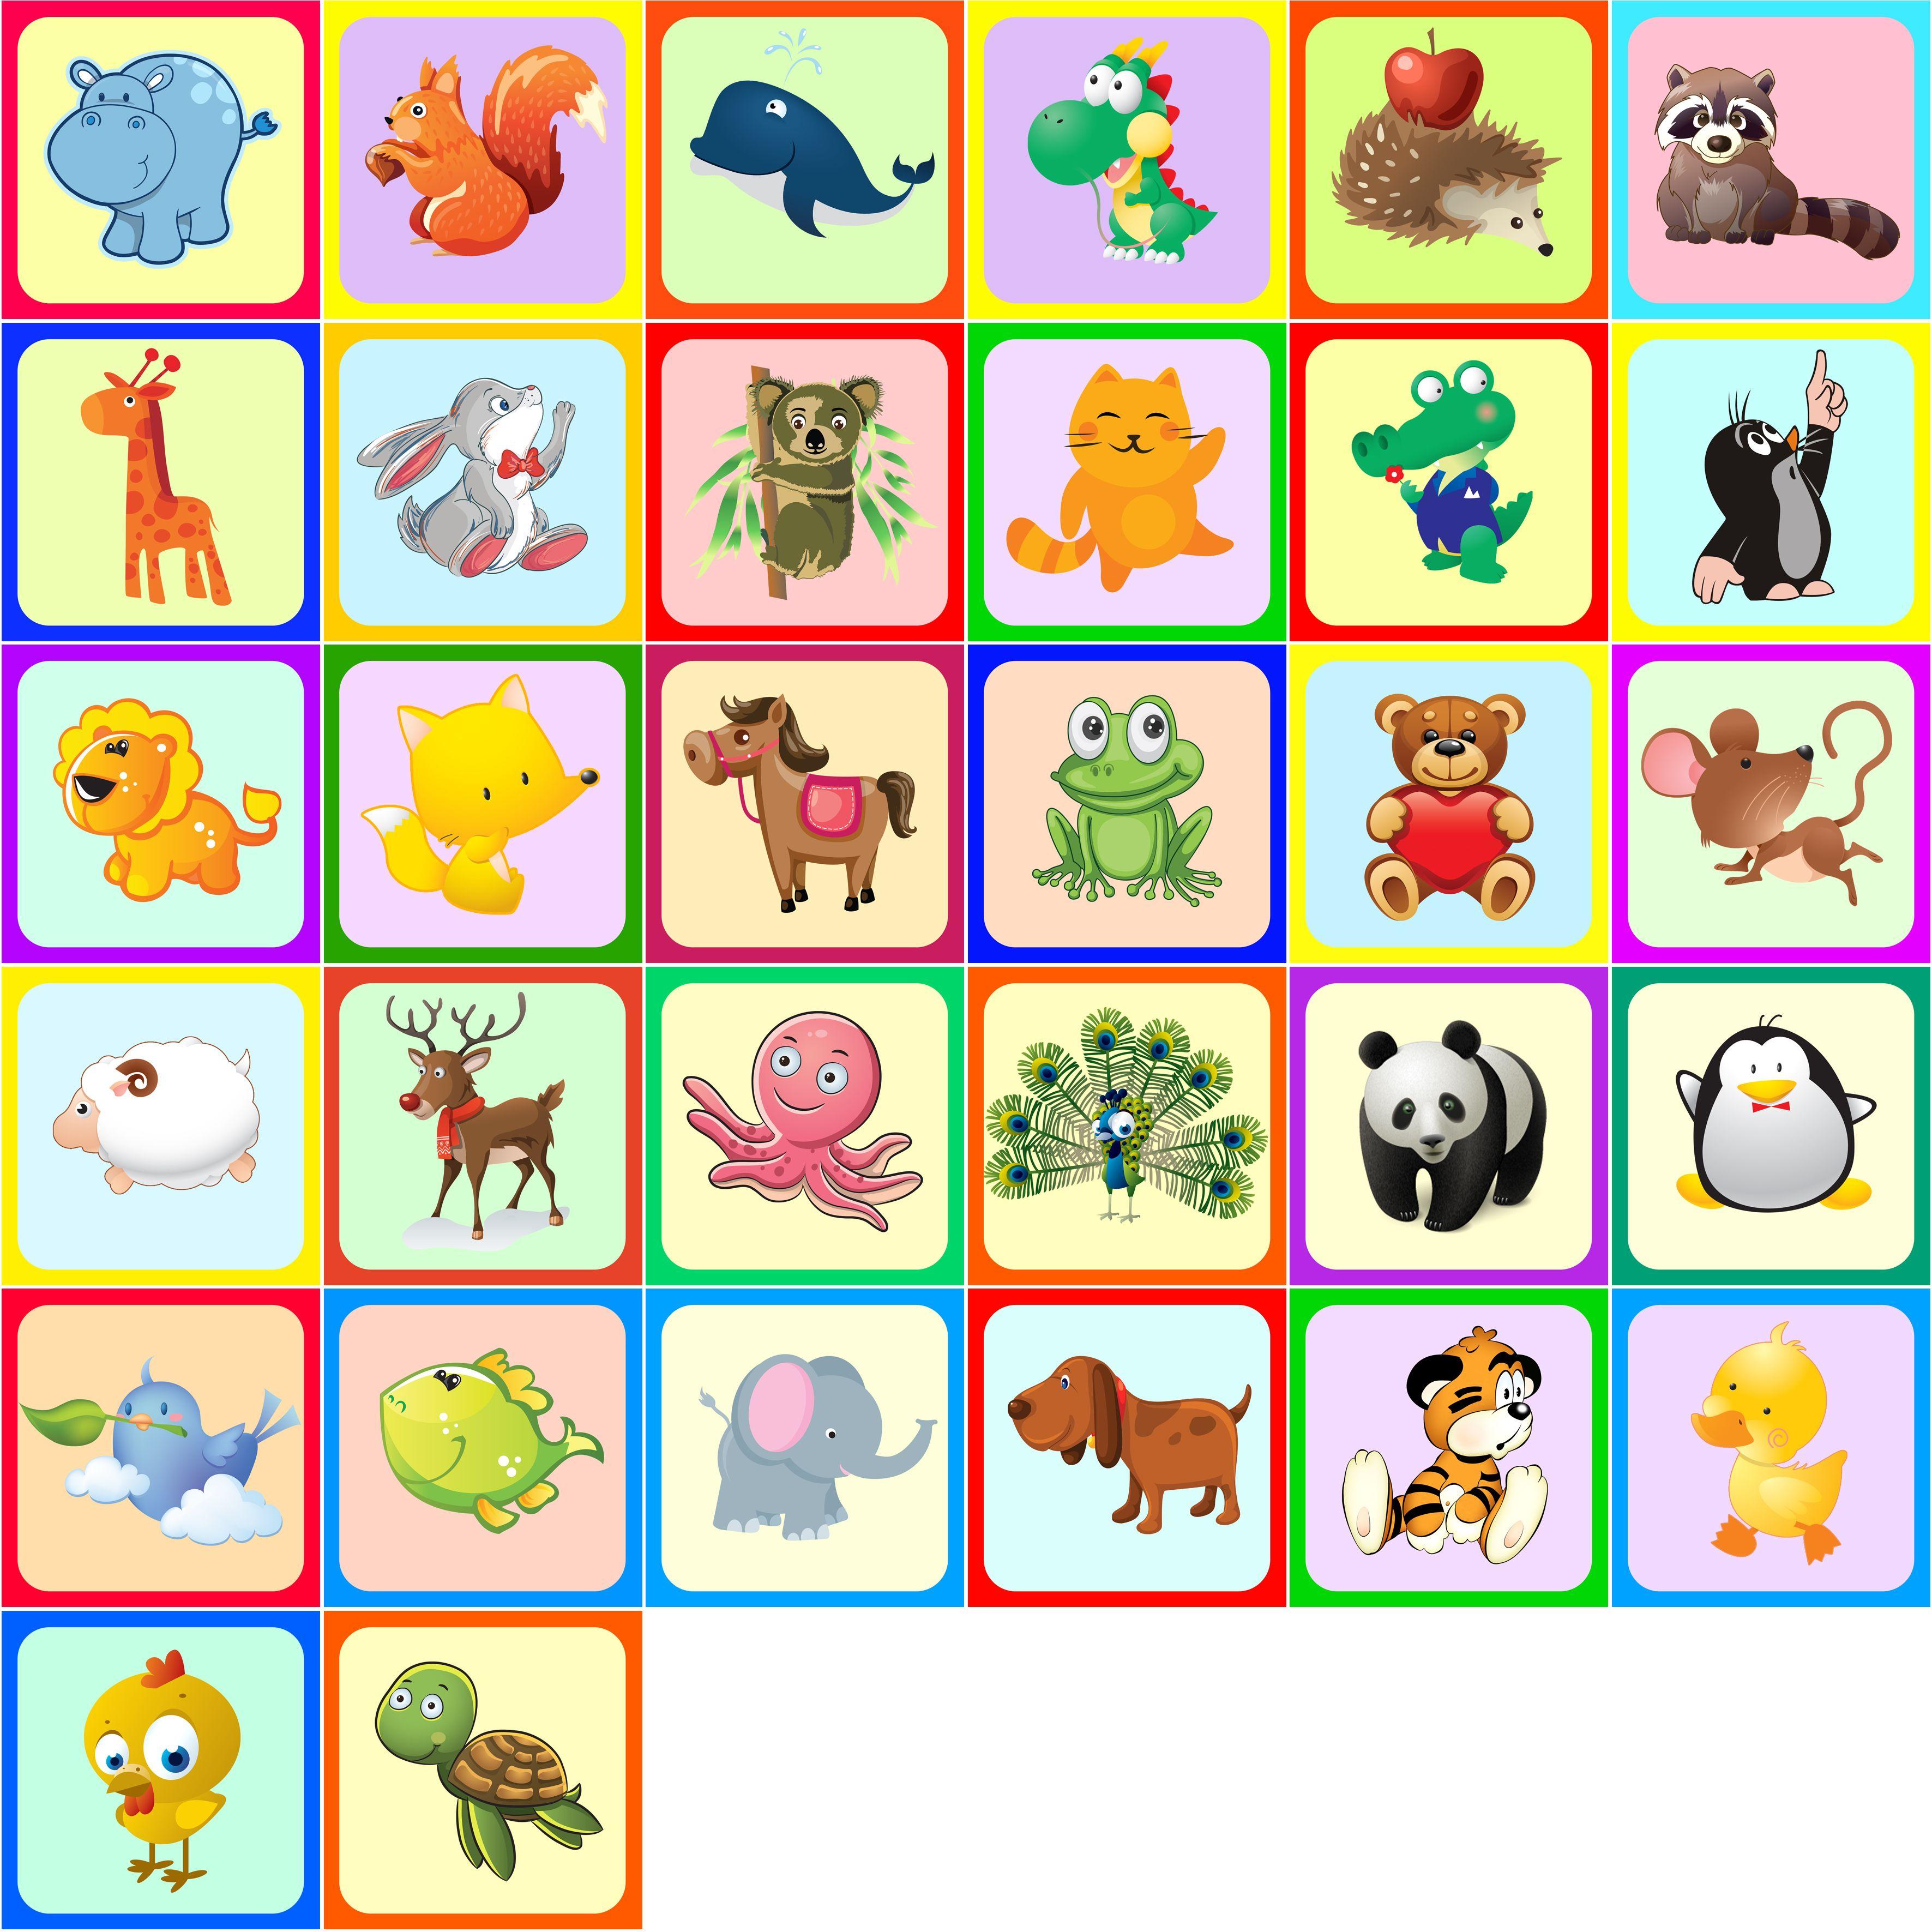 детские картинки для детского сада на шкафчики